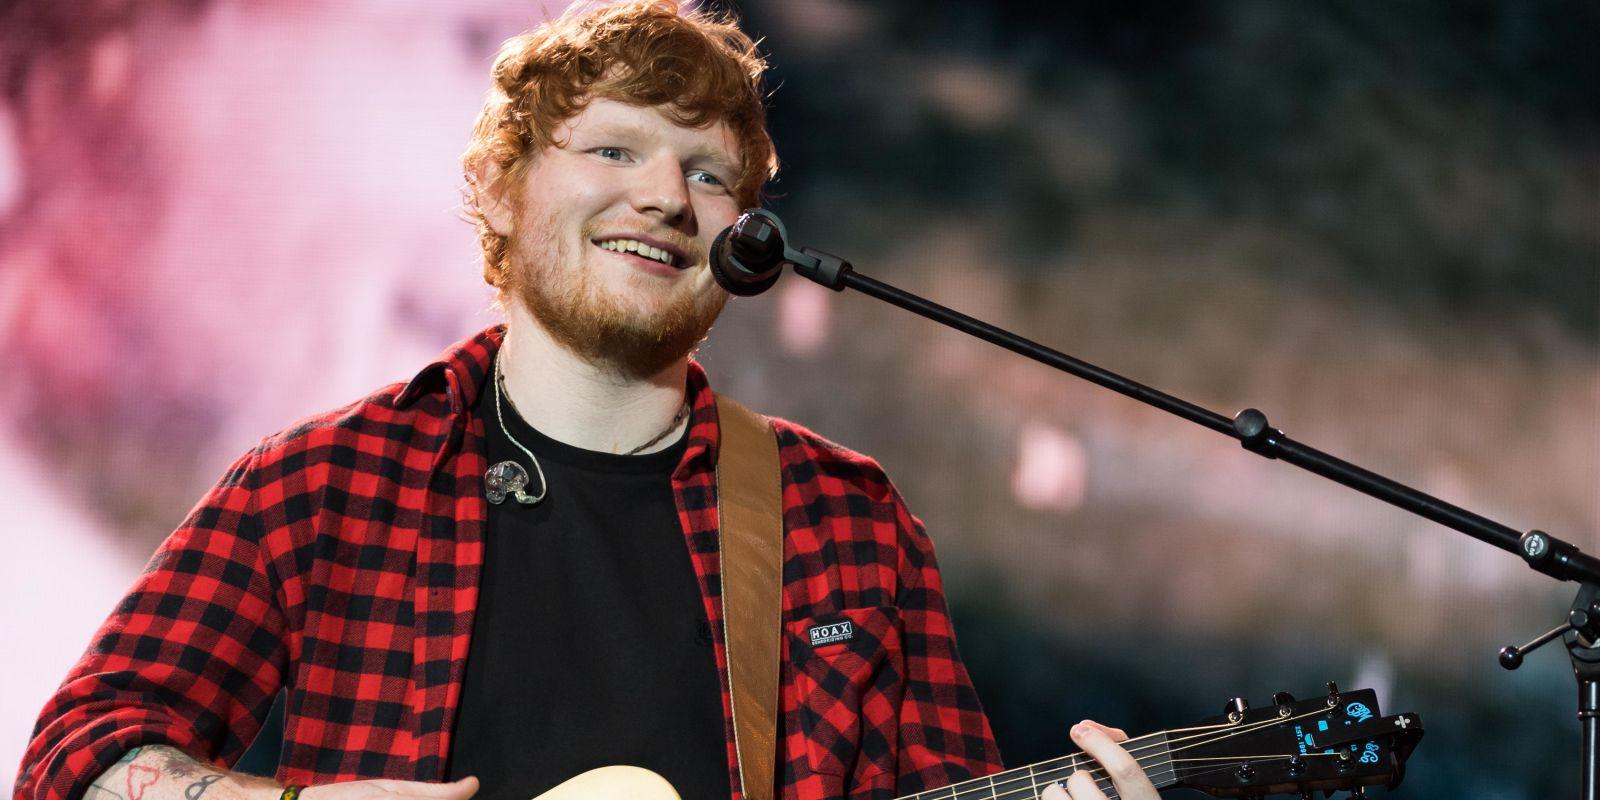 Looks Like Ed Sheeran Will Perform At The Royal Wedding